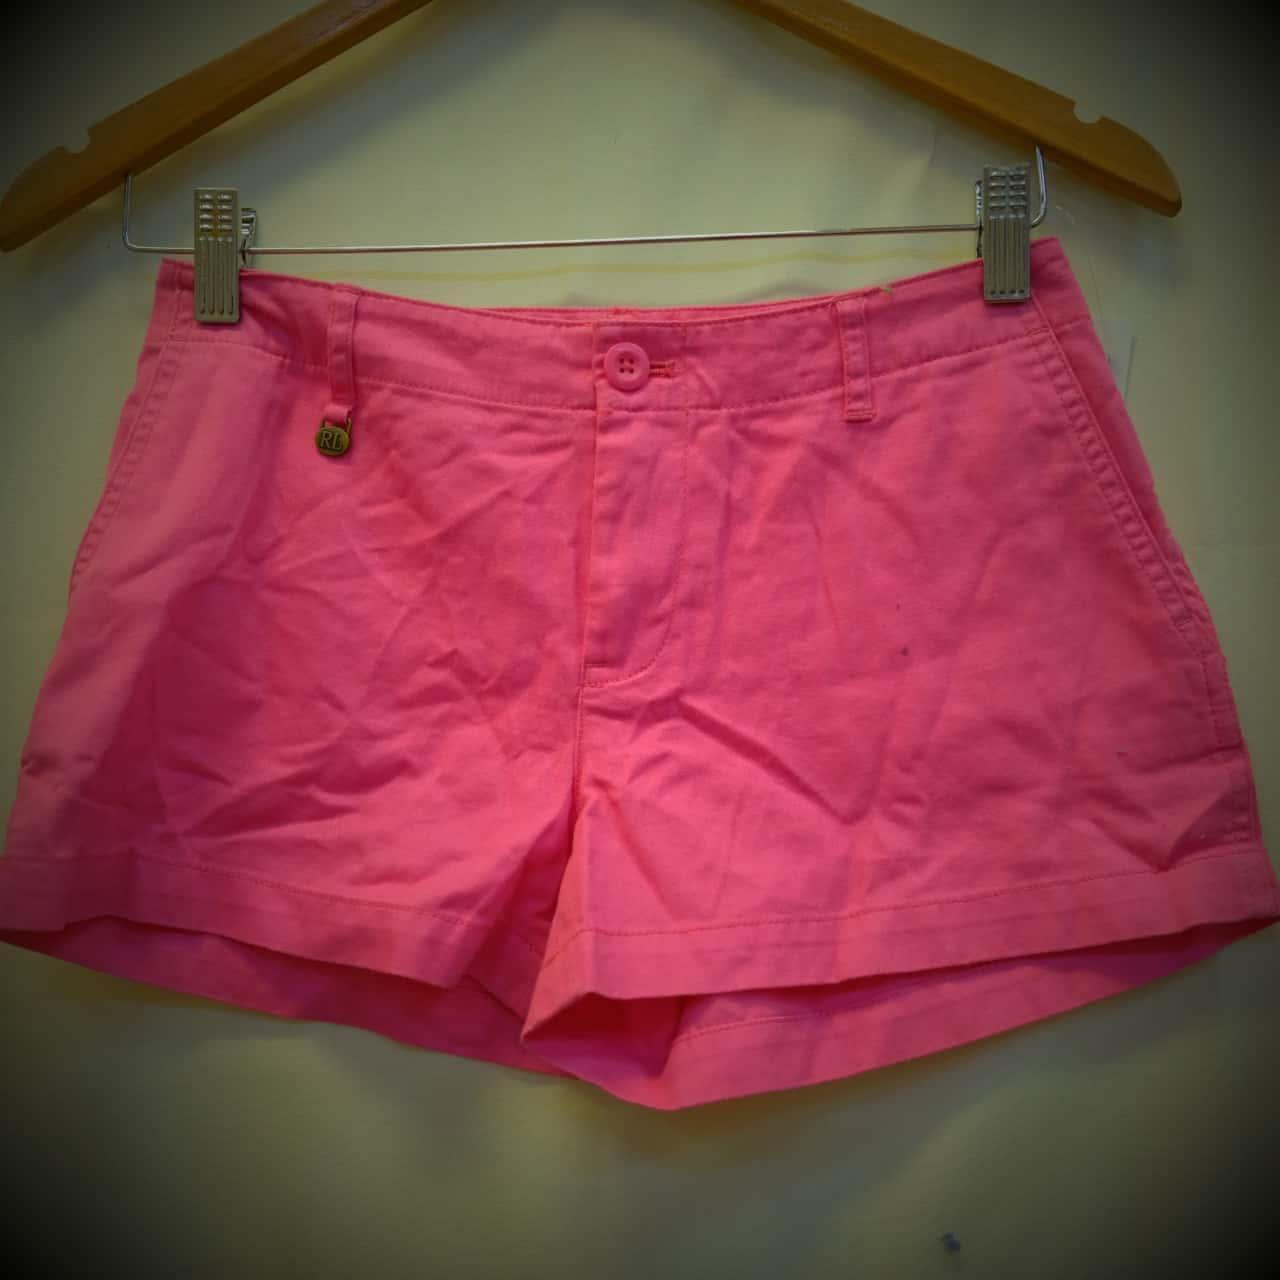 Polo Ralph Lauren Kids Size 12 Shorts Pink